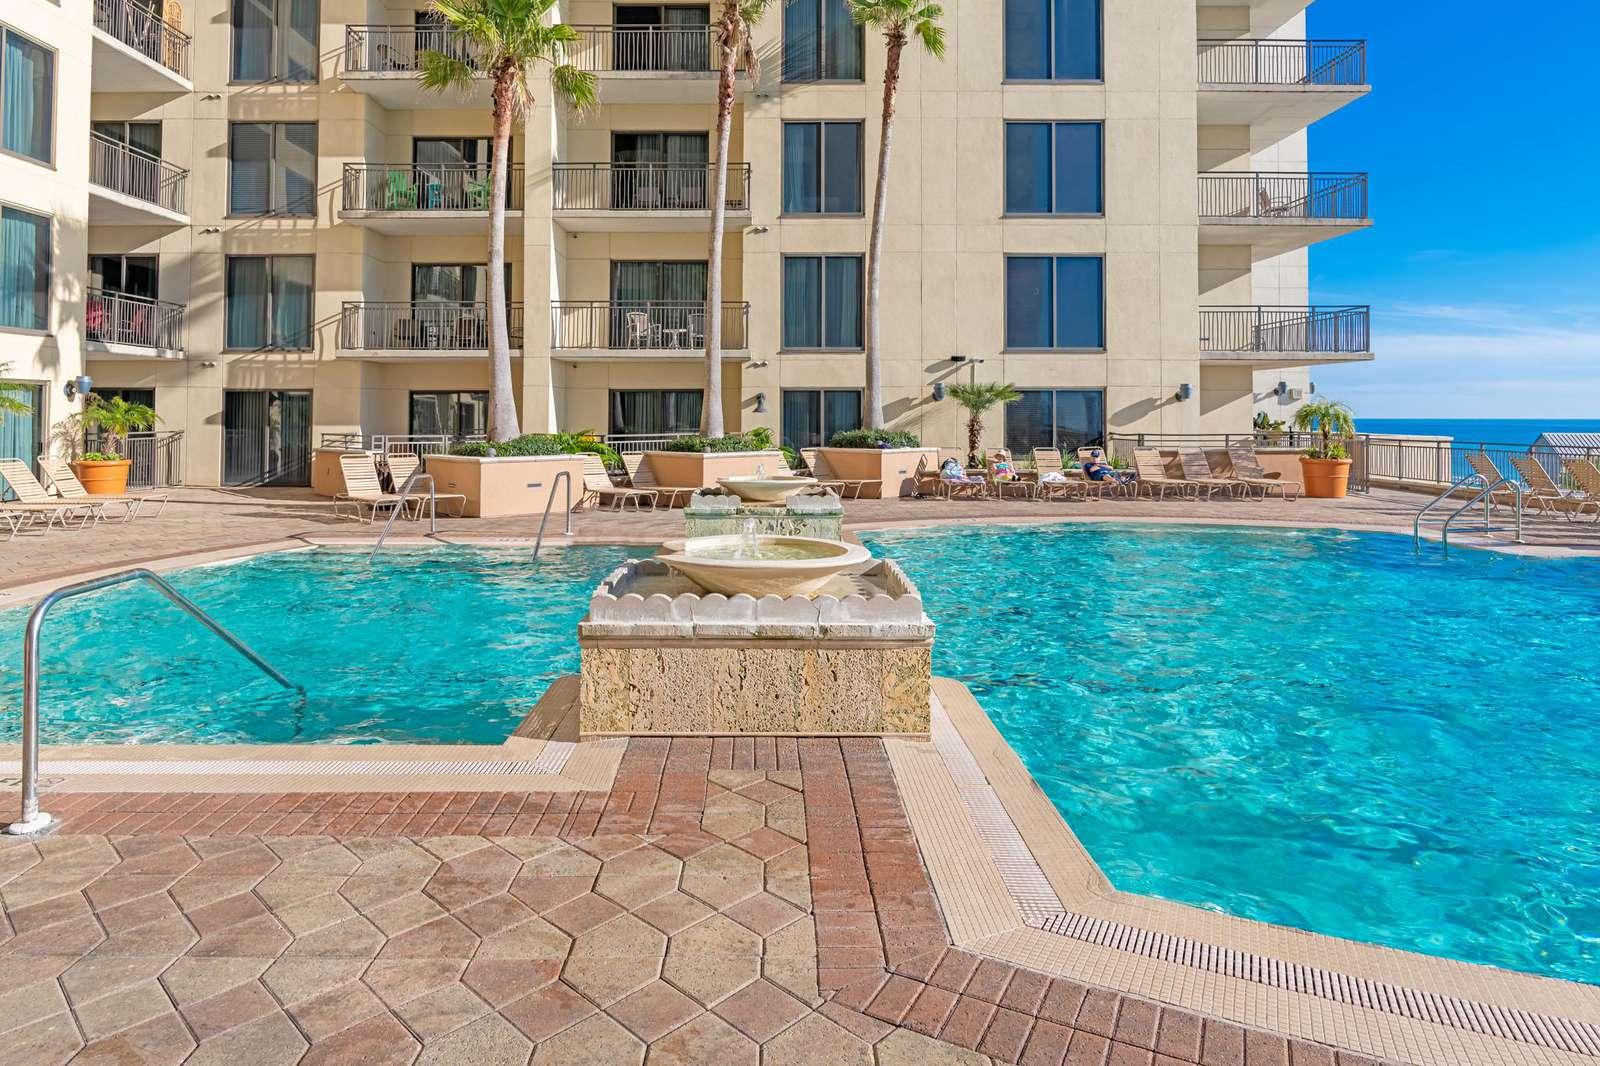 Beautiful fountains around the pool!